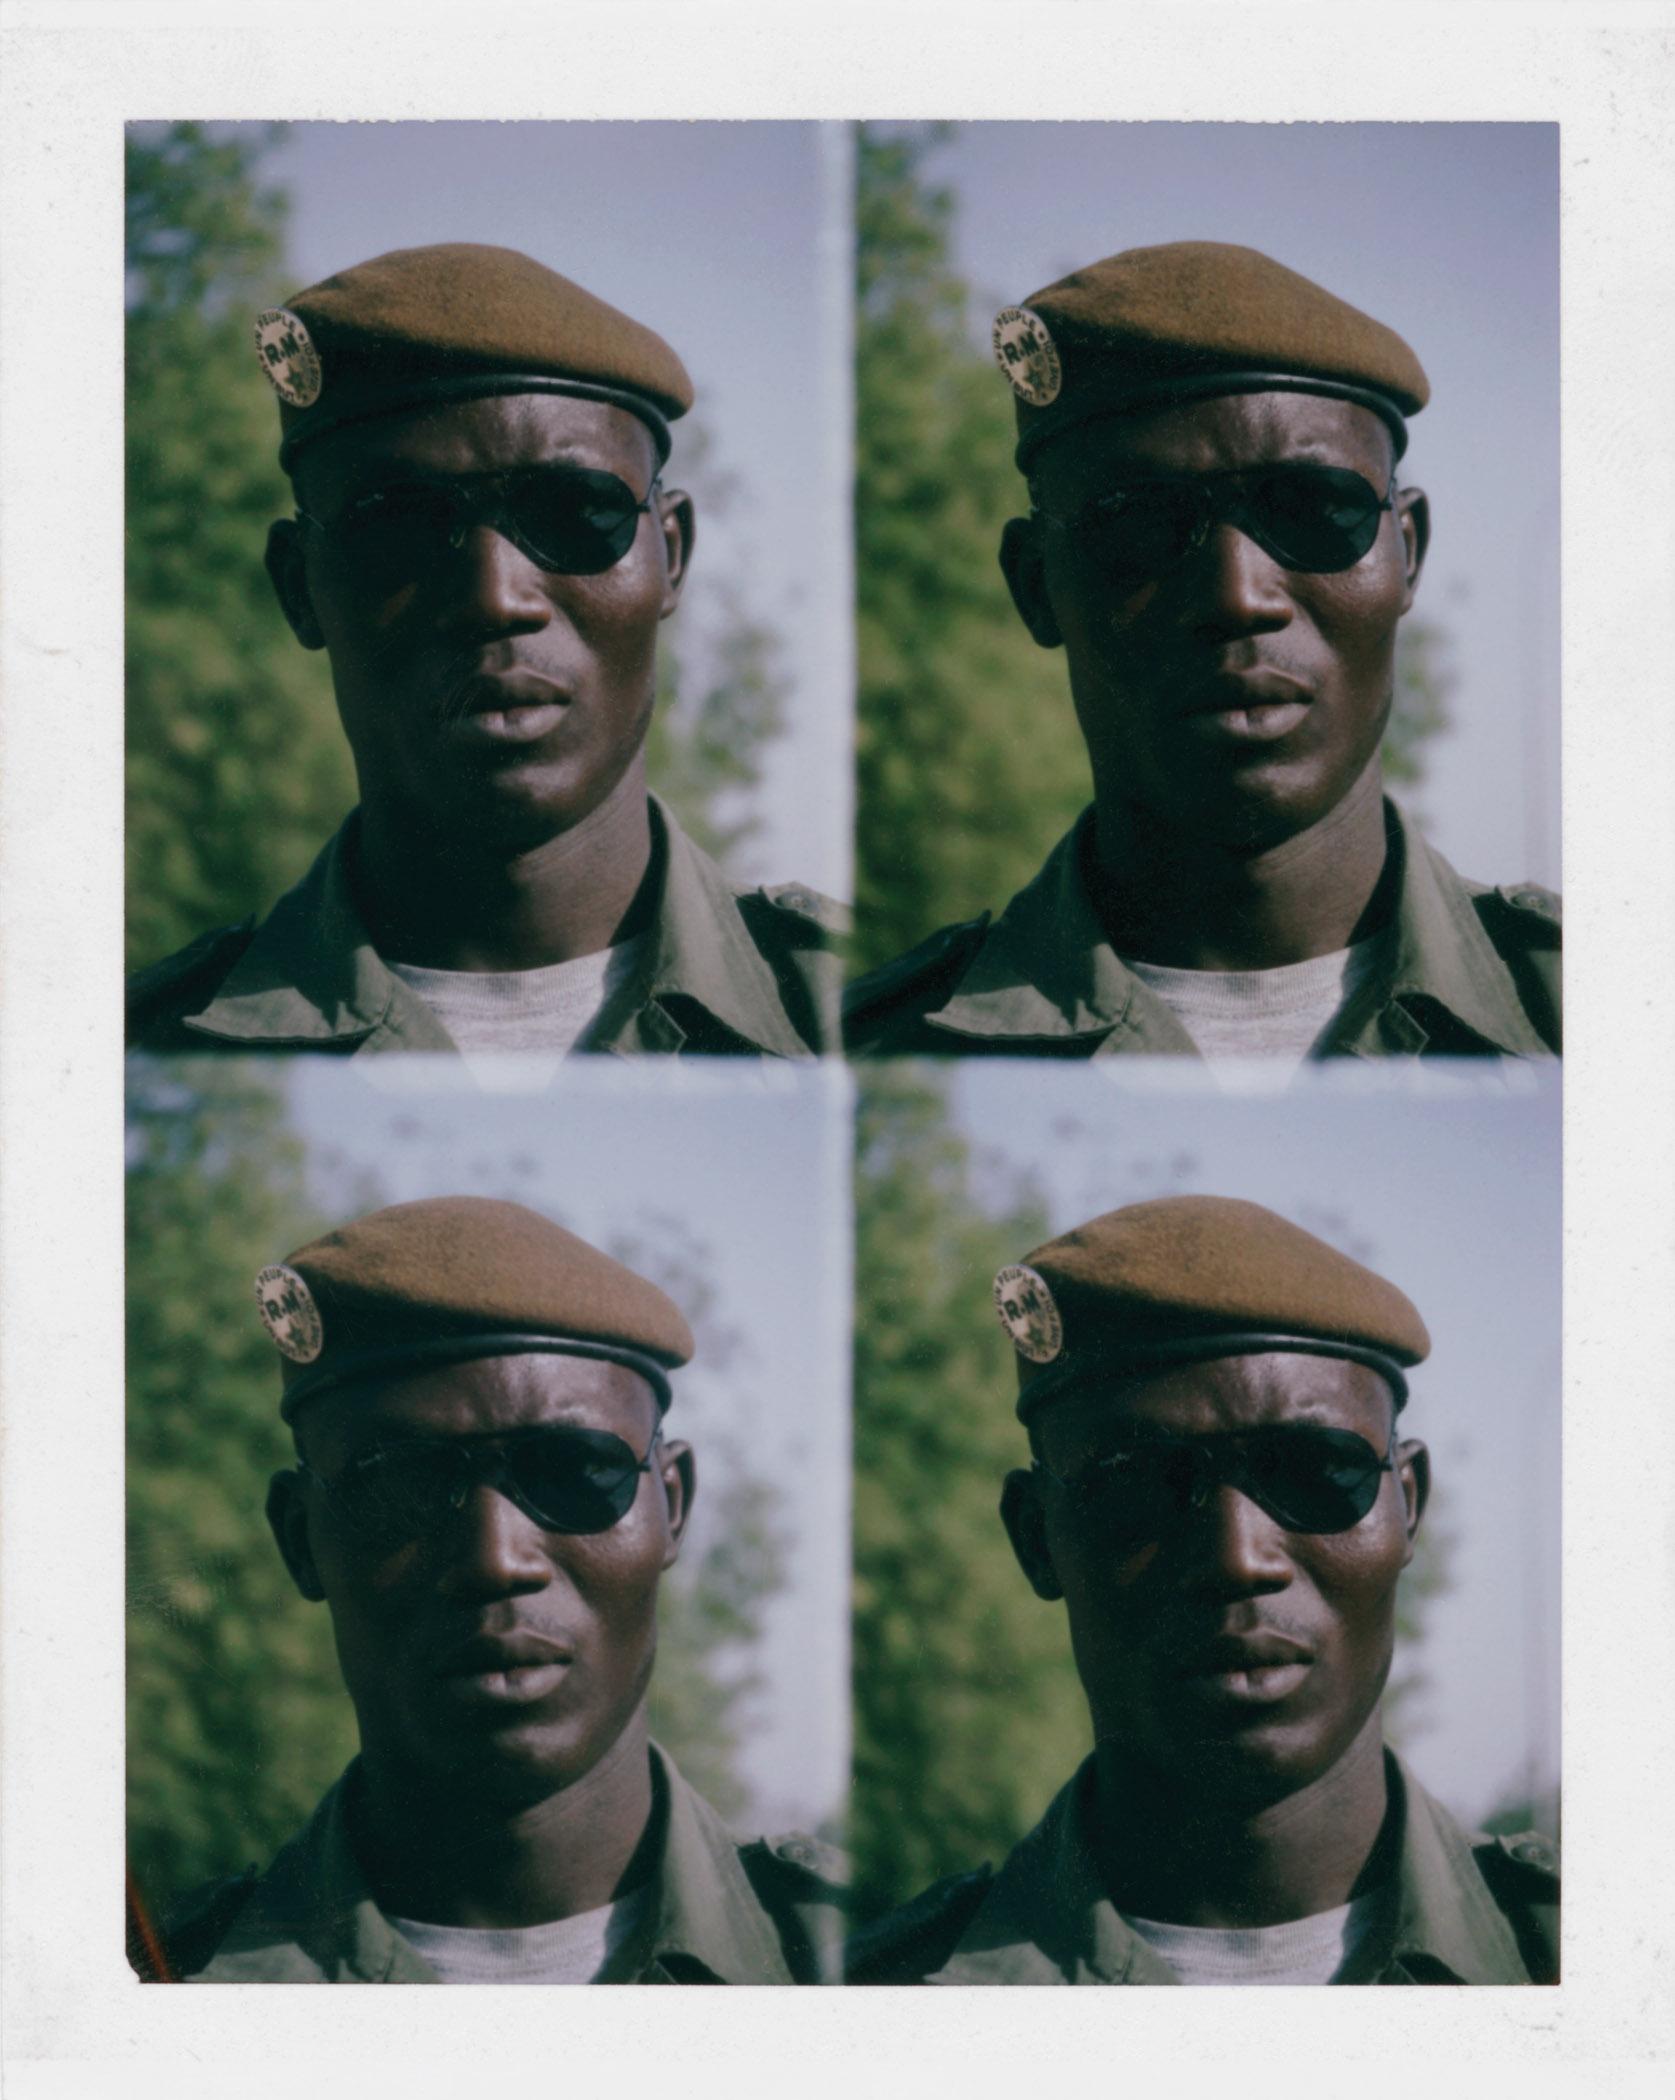 Émilie Régnier, Portrait of Sidiyaya Diakate, a member of the national guards, Bamako, Mali, 2013